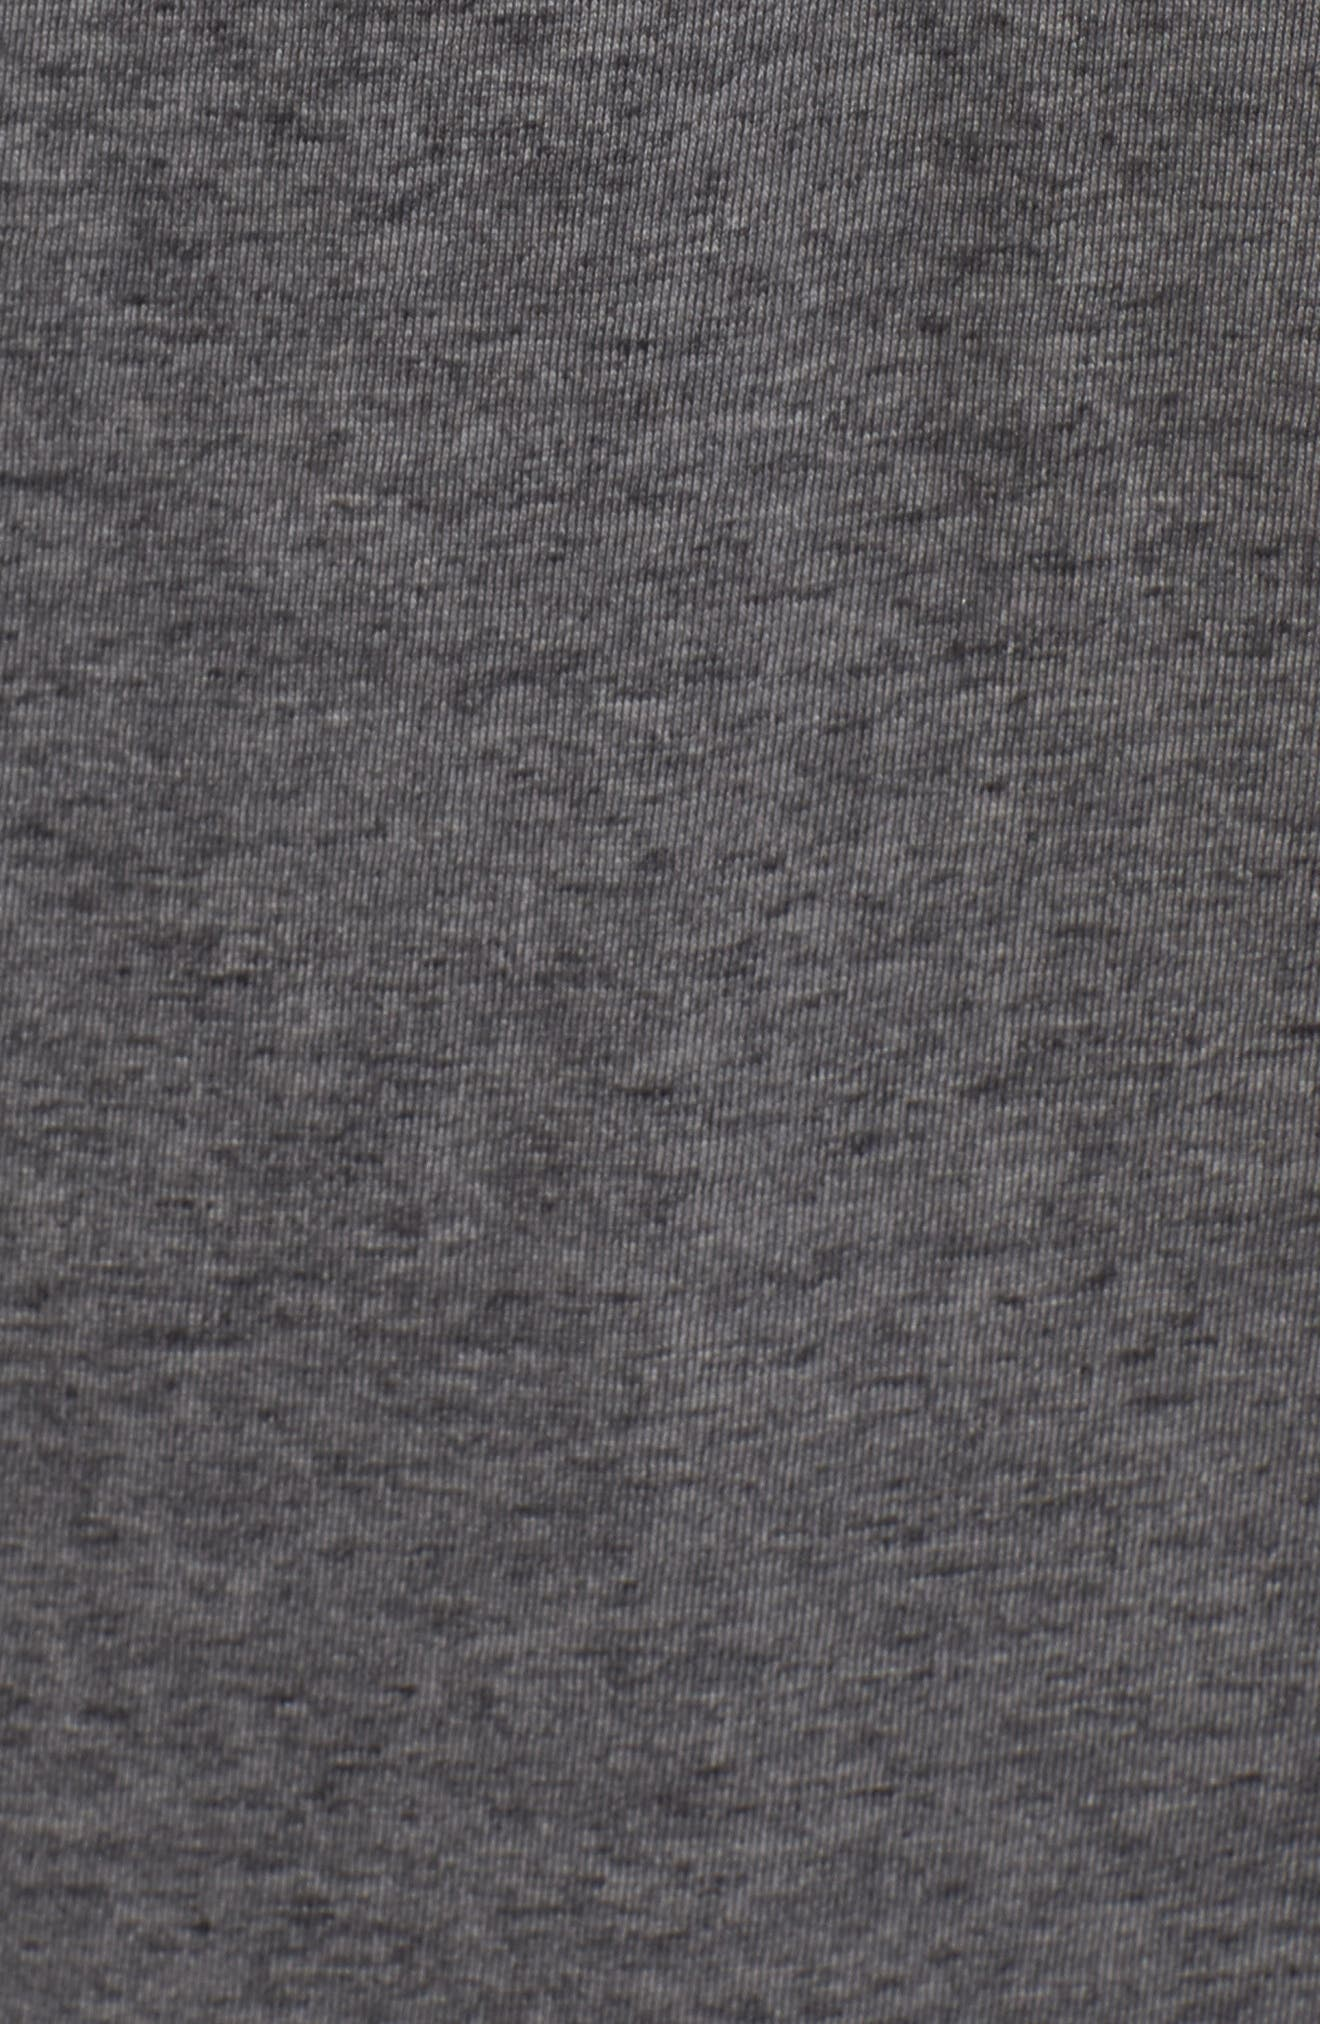 Oil-Washed Pocket T-Shirt,                             Alternate thumbnail 5, color,                             021